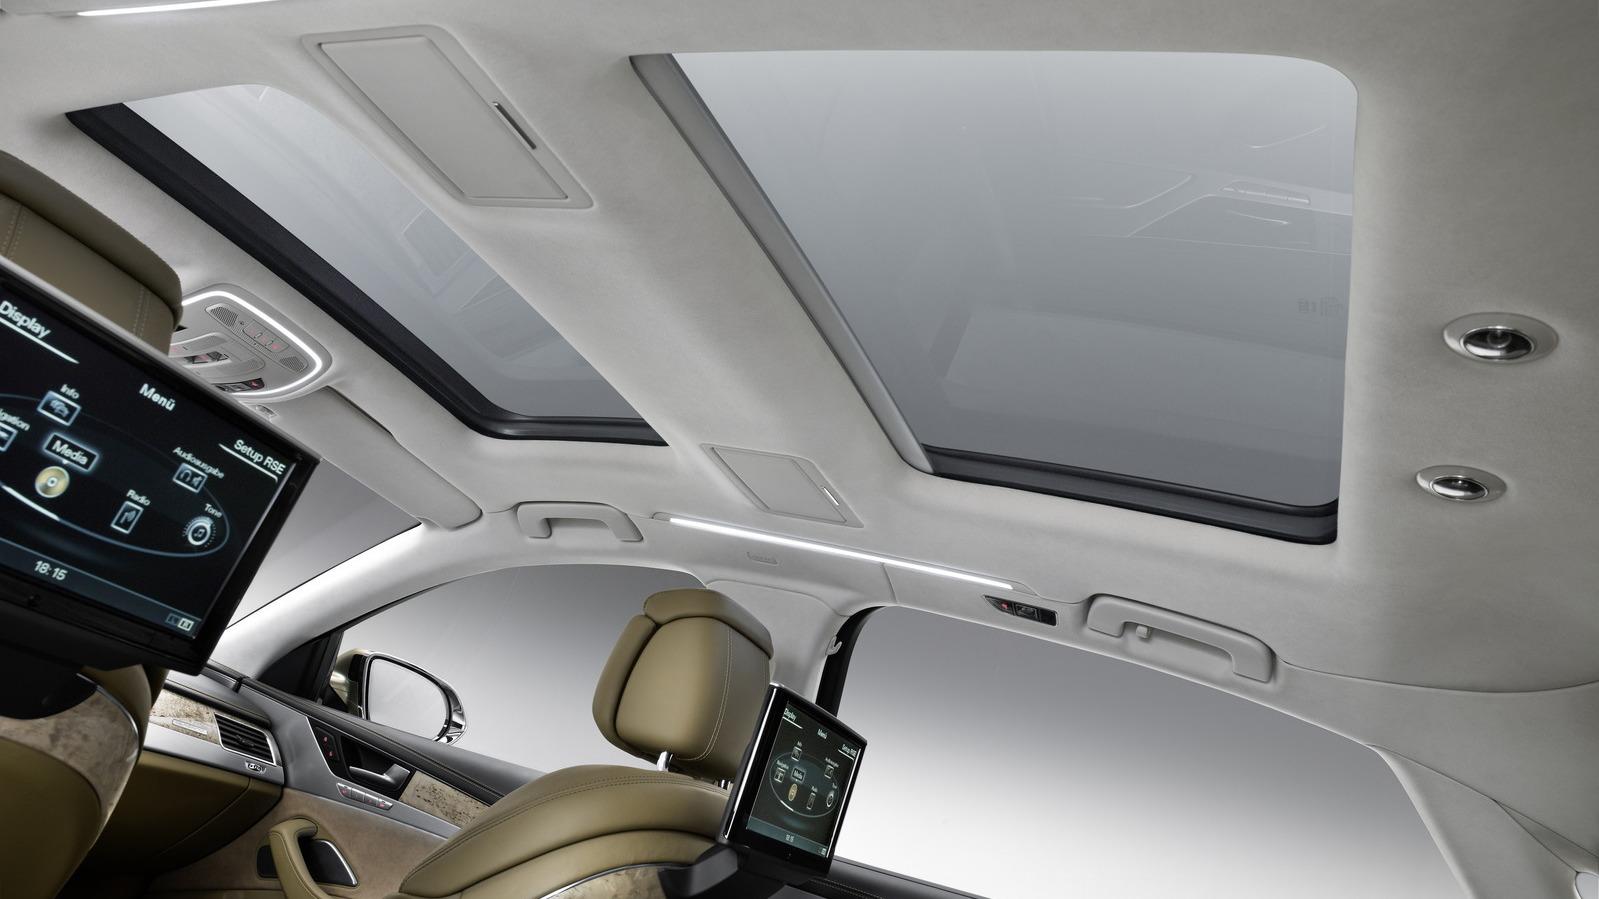 2011 Audi A8 L W-12 quattro